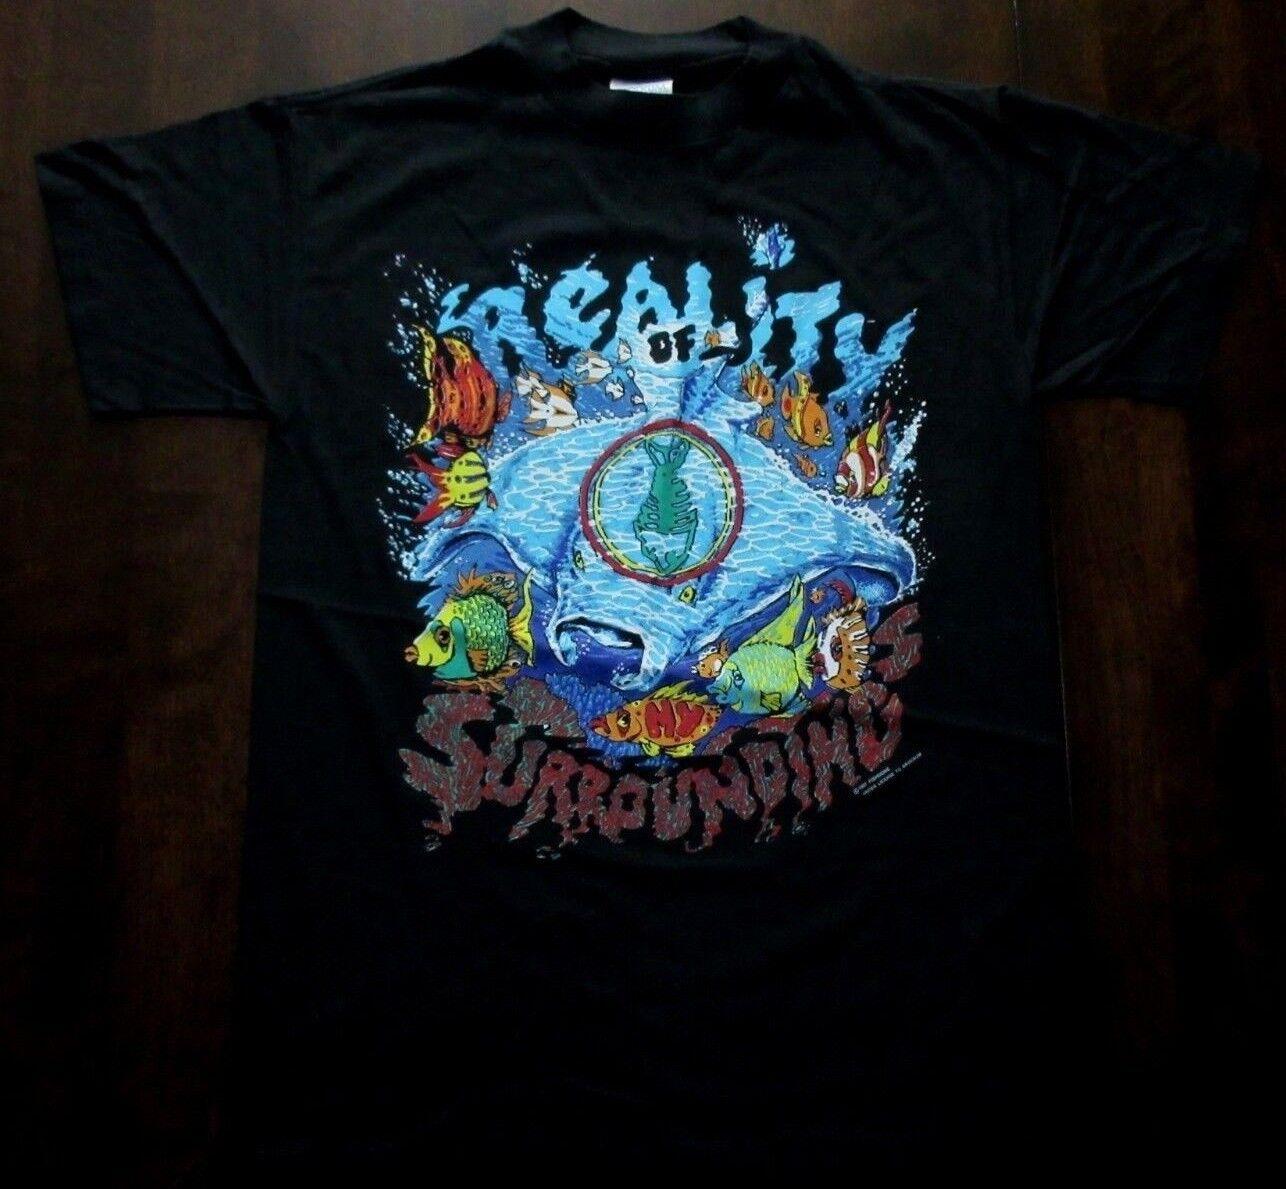 FISHBONE T Shirt VTG NOS Reality of my Surroundings 91 TOUR USA PUNK SKA 90'S